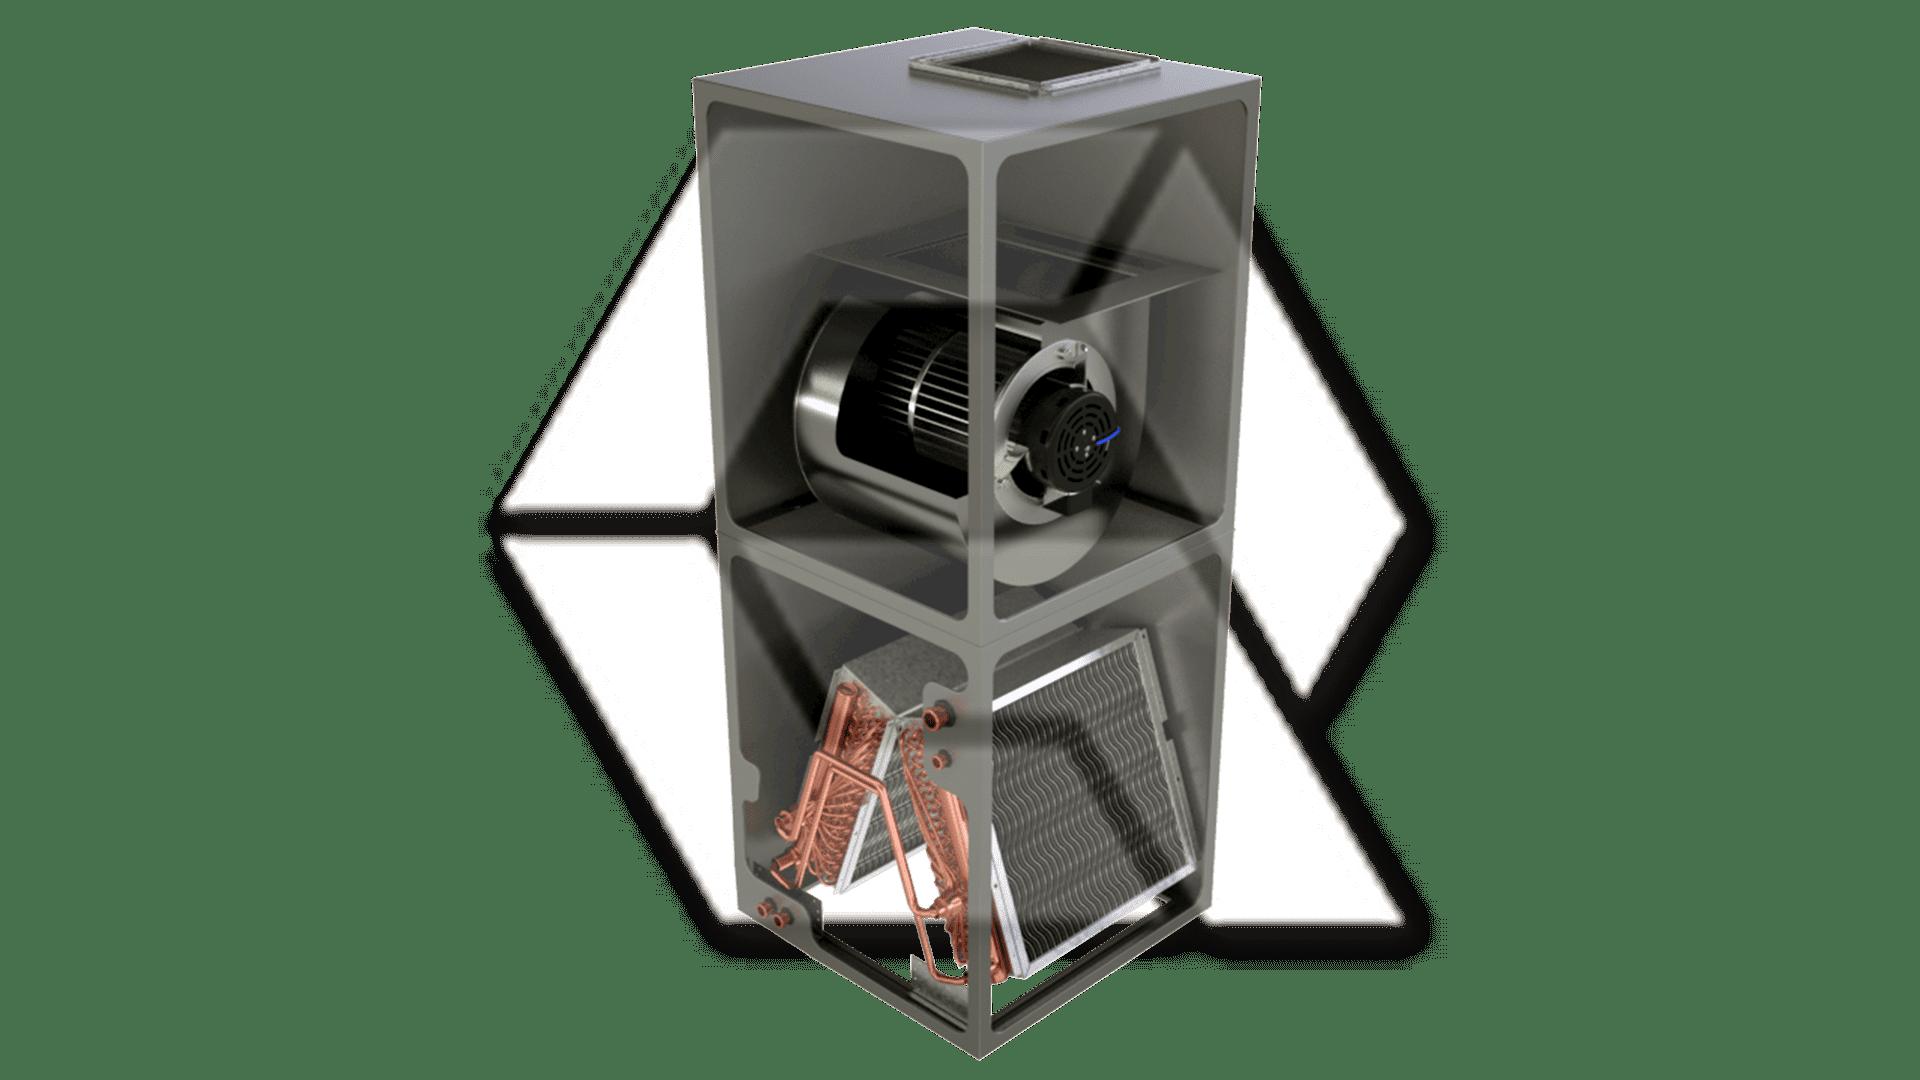 Amana-AVPTC Split System - Indoor Vertical